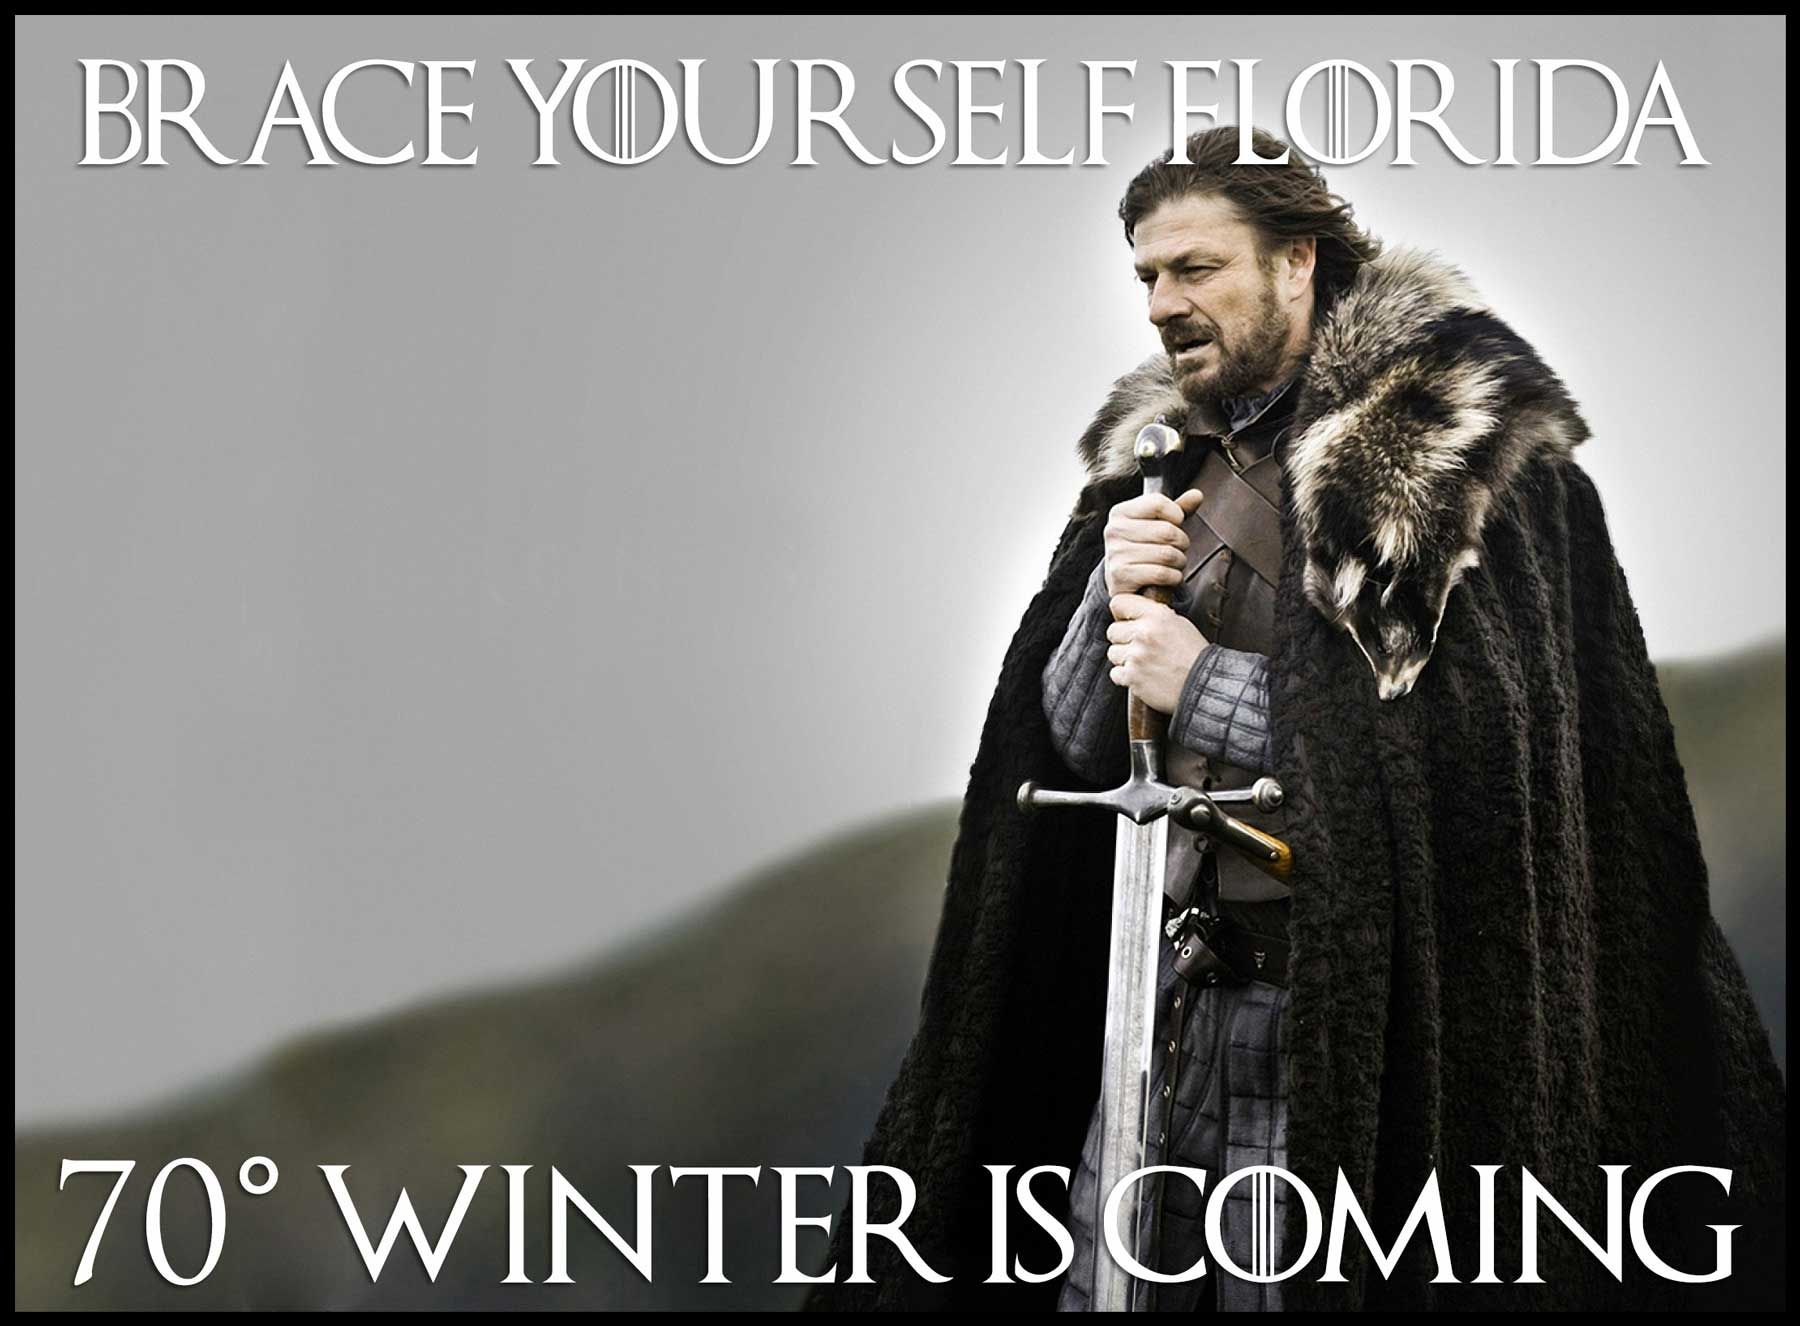 Game of Thrones Memes Winter is coming meme, Memes, Florida